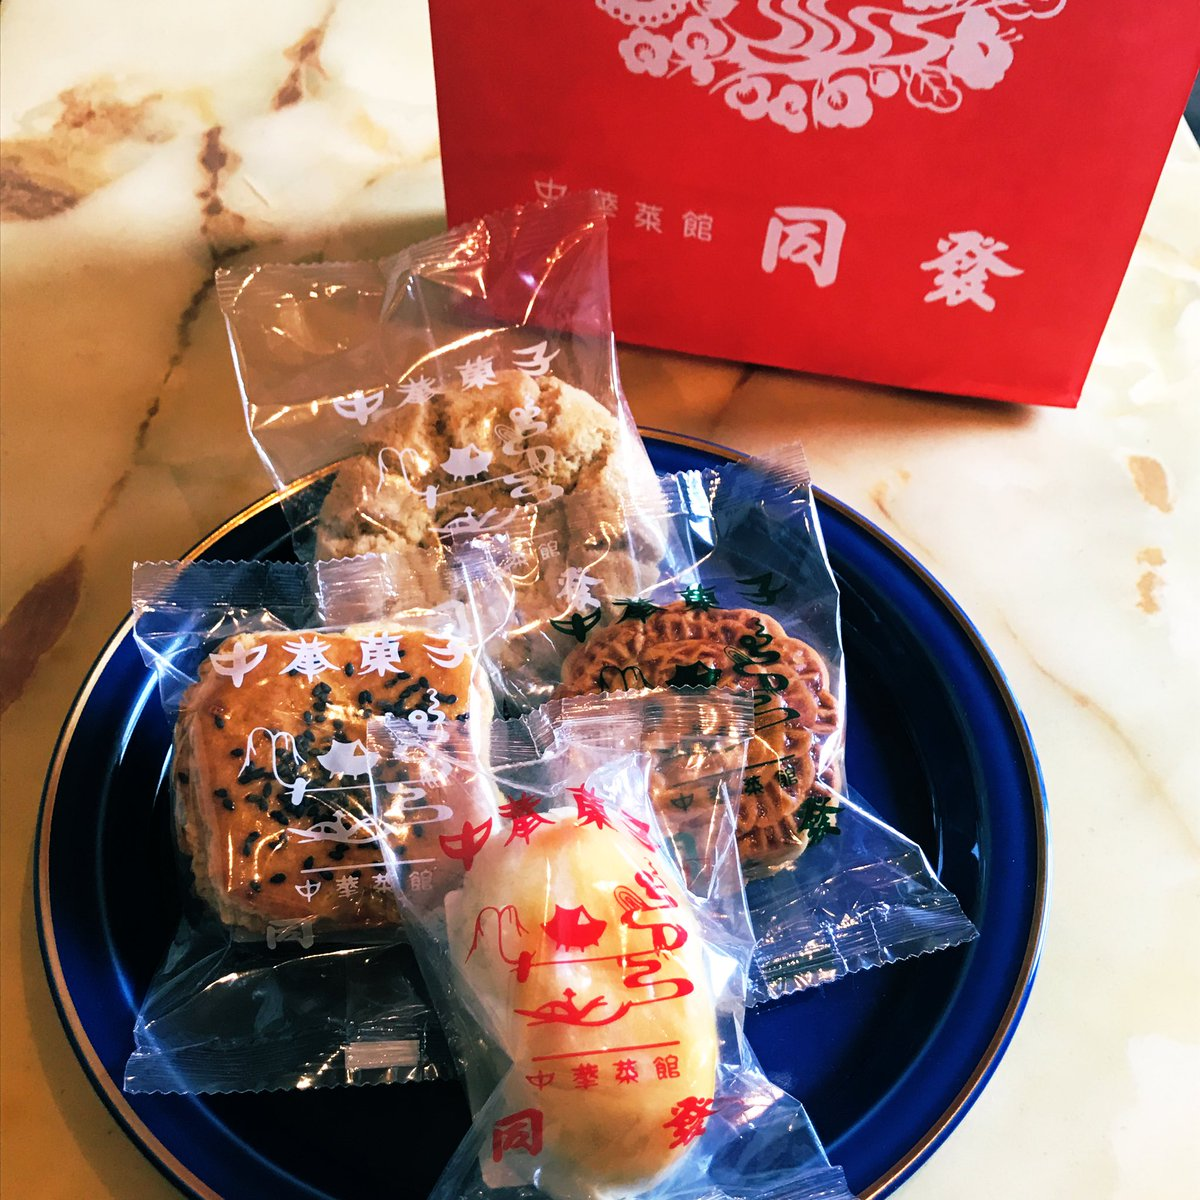 test ツイッターメディア - 昨日のお土産。馬車道十番館のマドレーヌと同發の中華菓子。 https://t.co/IFqAhjdEOT